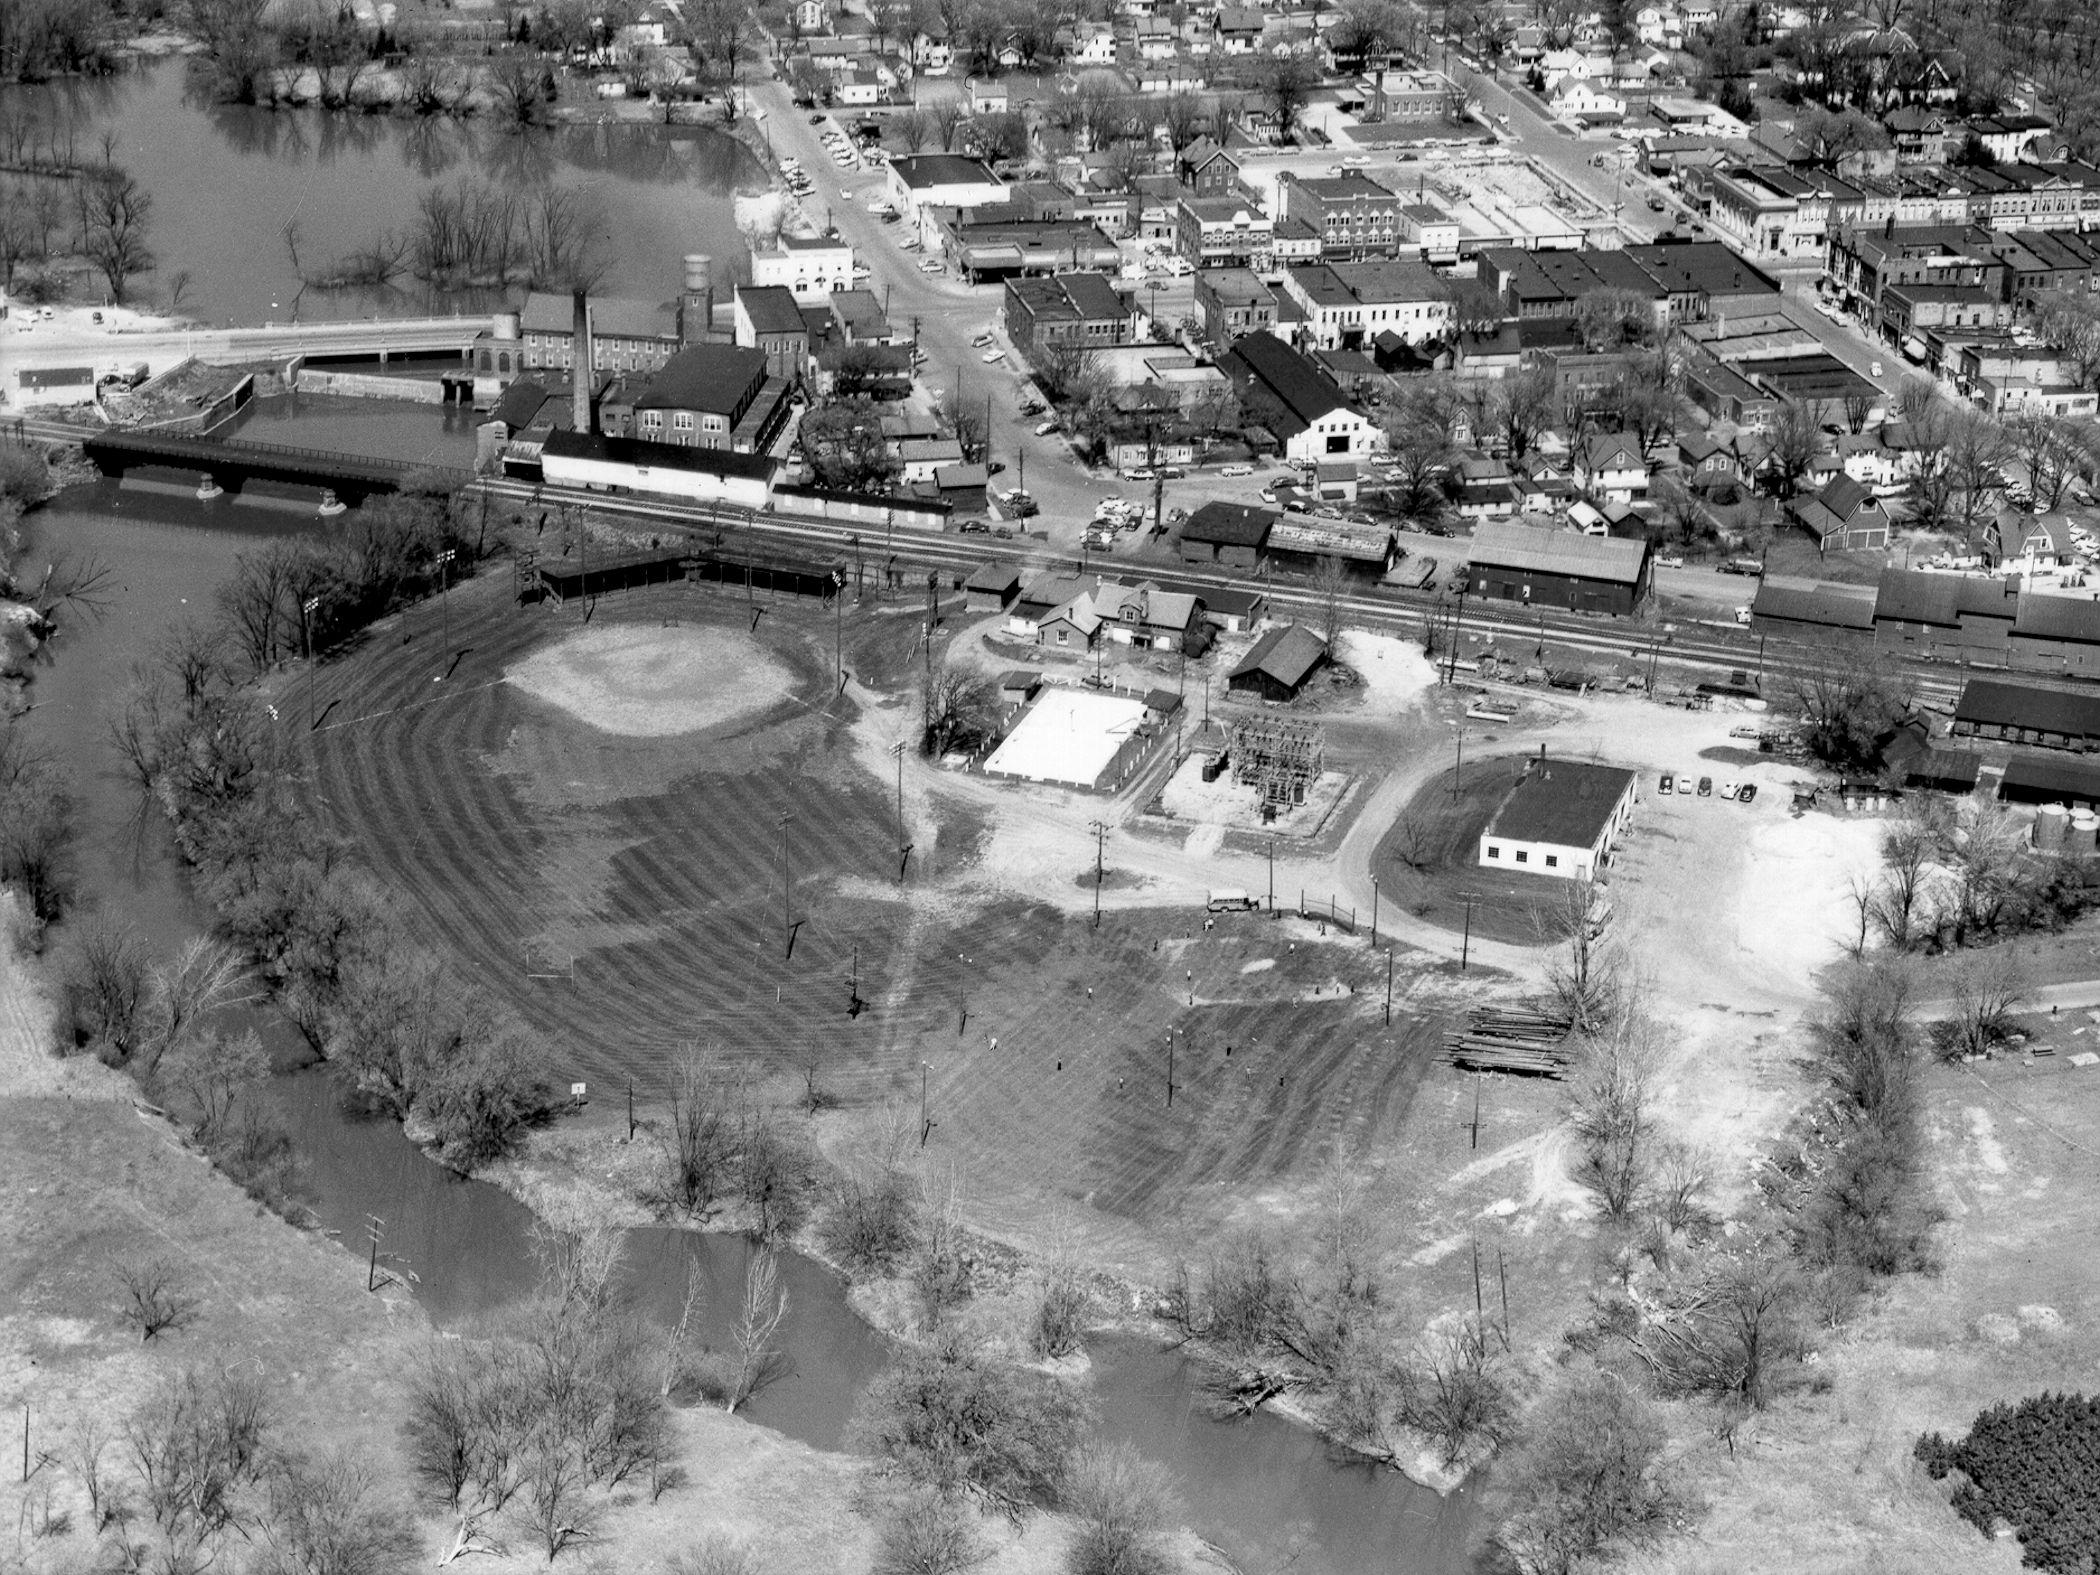 1958 - Ball Diamond, left